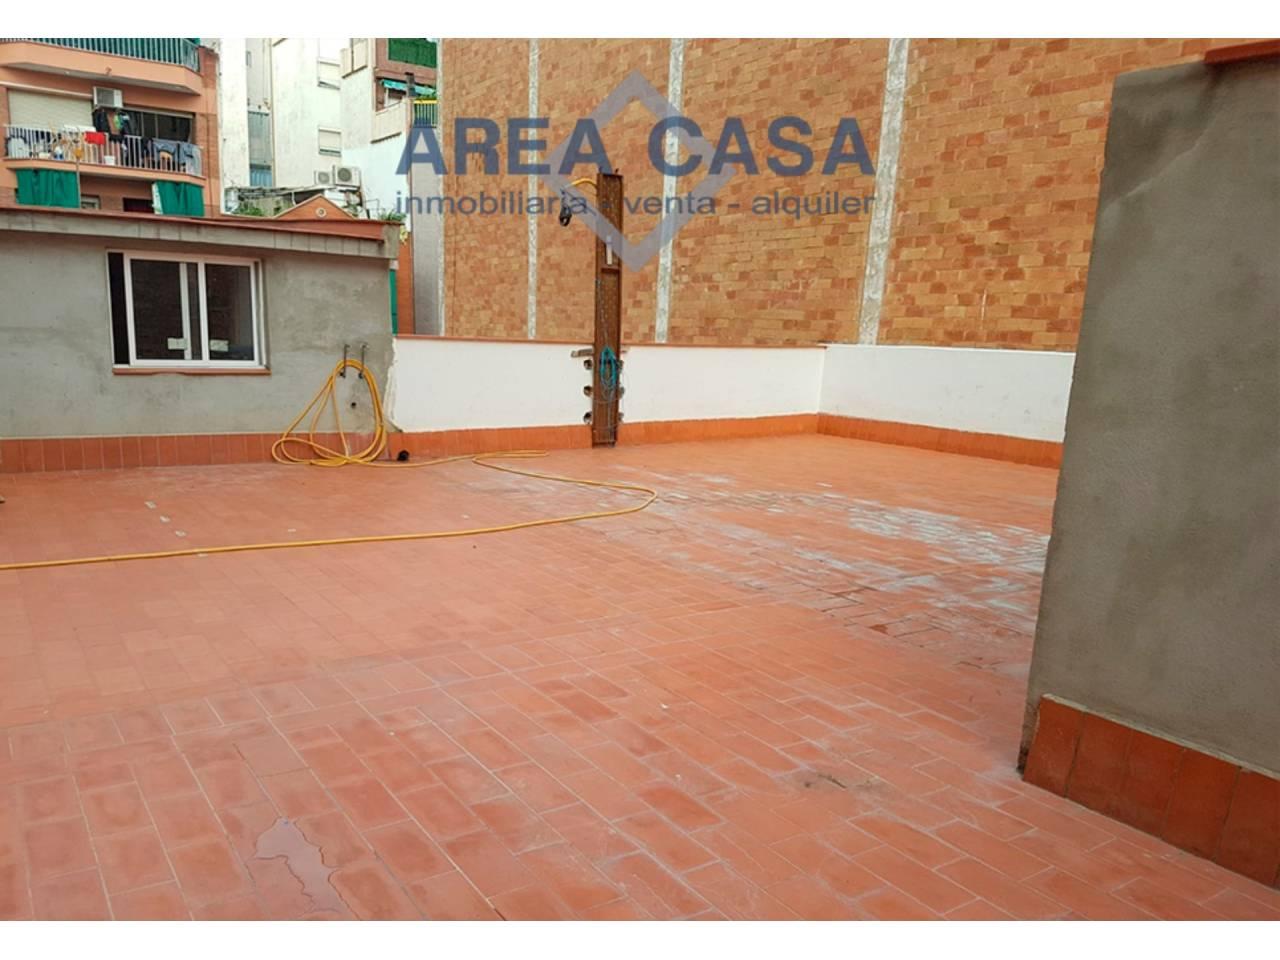 Affitto Casa  Centre-sanfeliu-sant josep. Ref 90203  superficie total 150 m²,  casa superficie útil 70